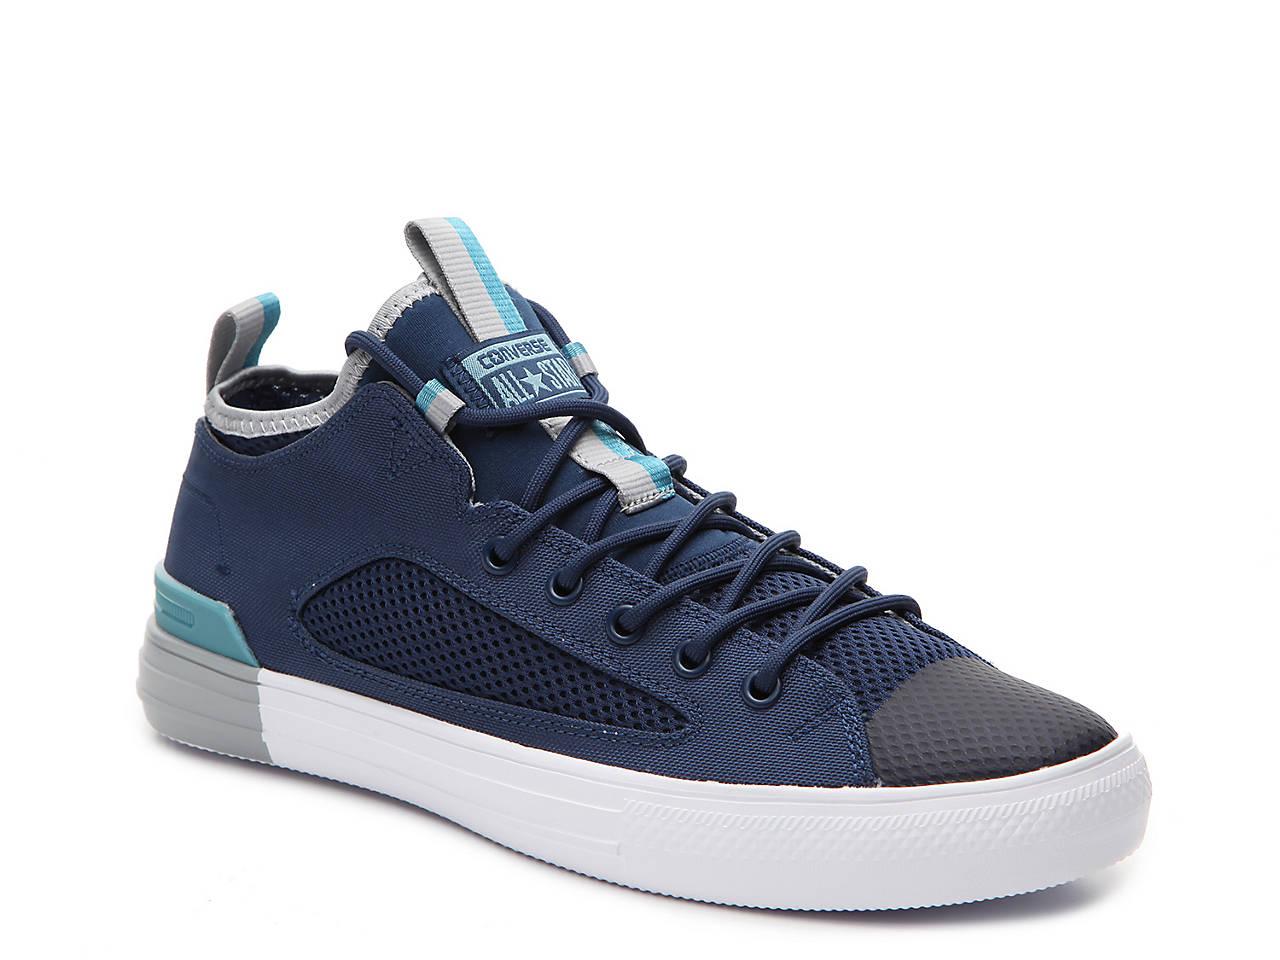 Converse Chuck Taylor All Star Ultra Lite Sneaker - Men s Men s ... 9e601e972